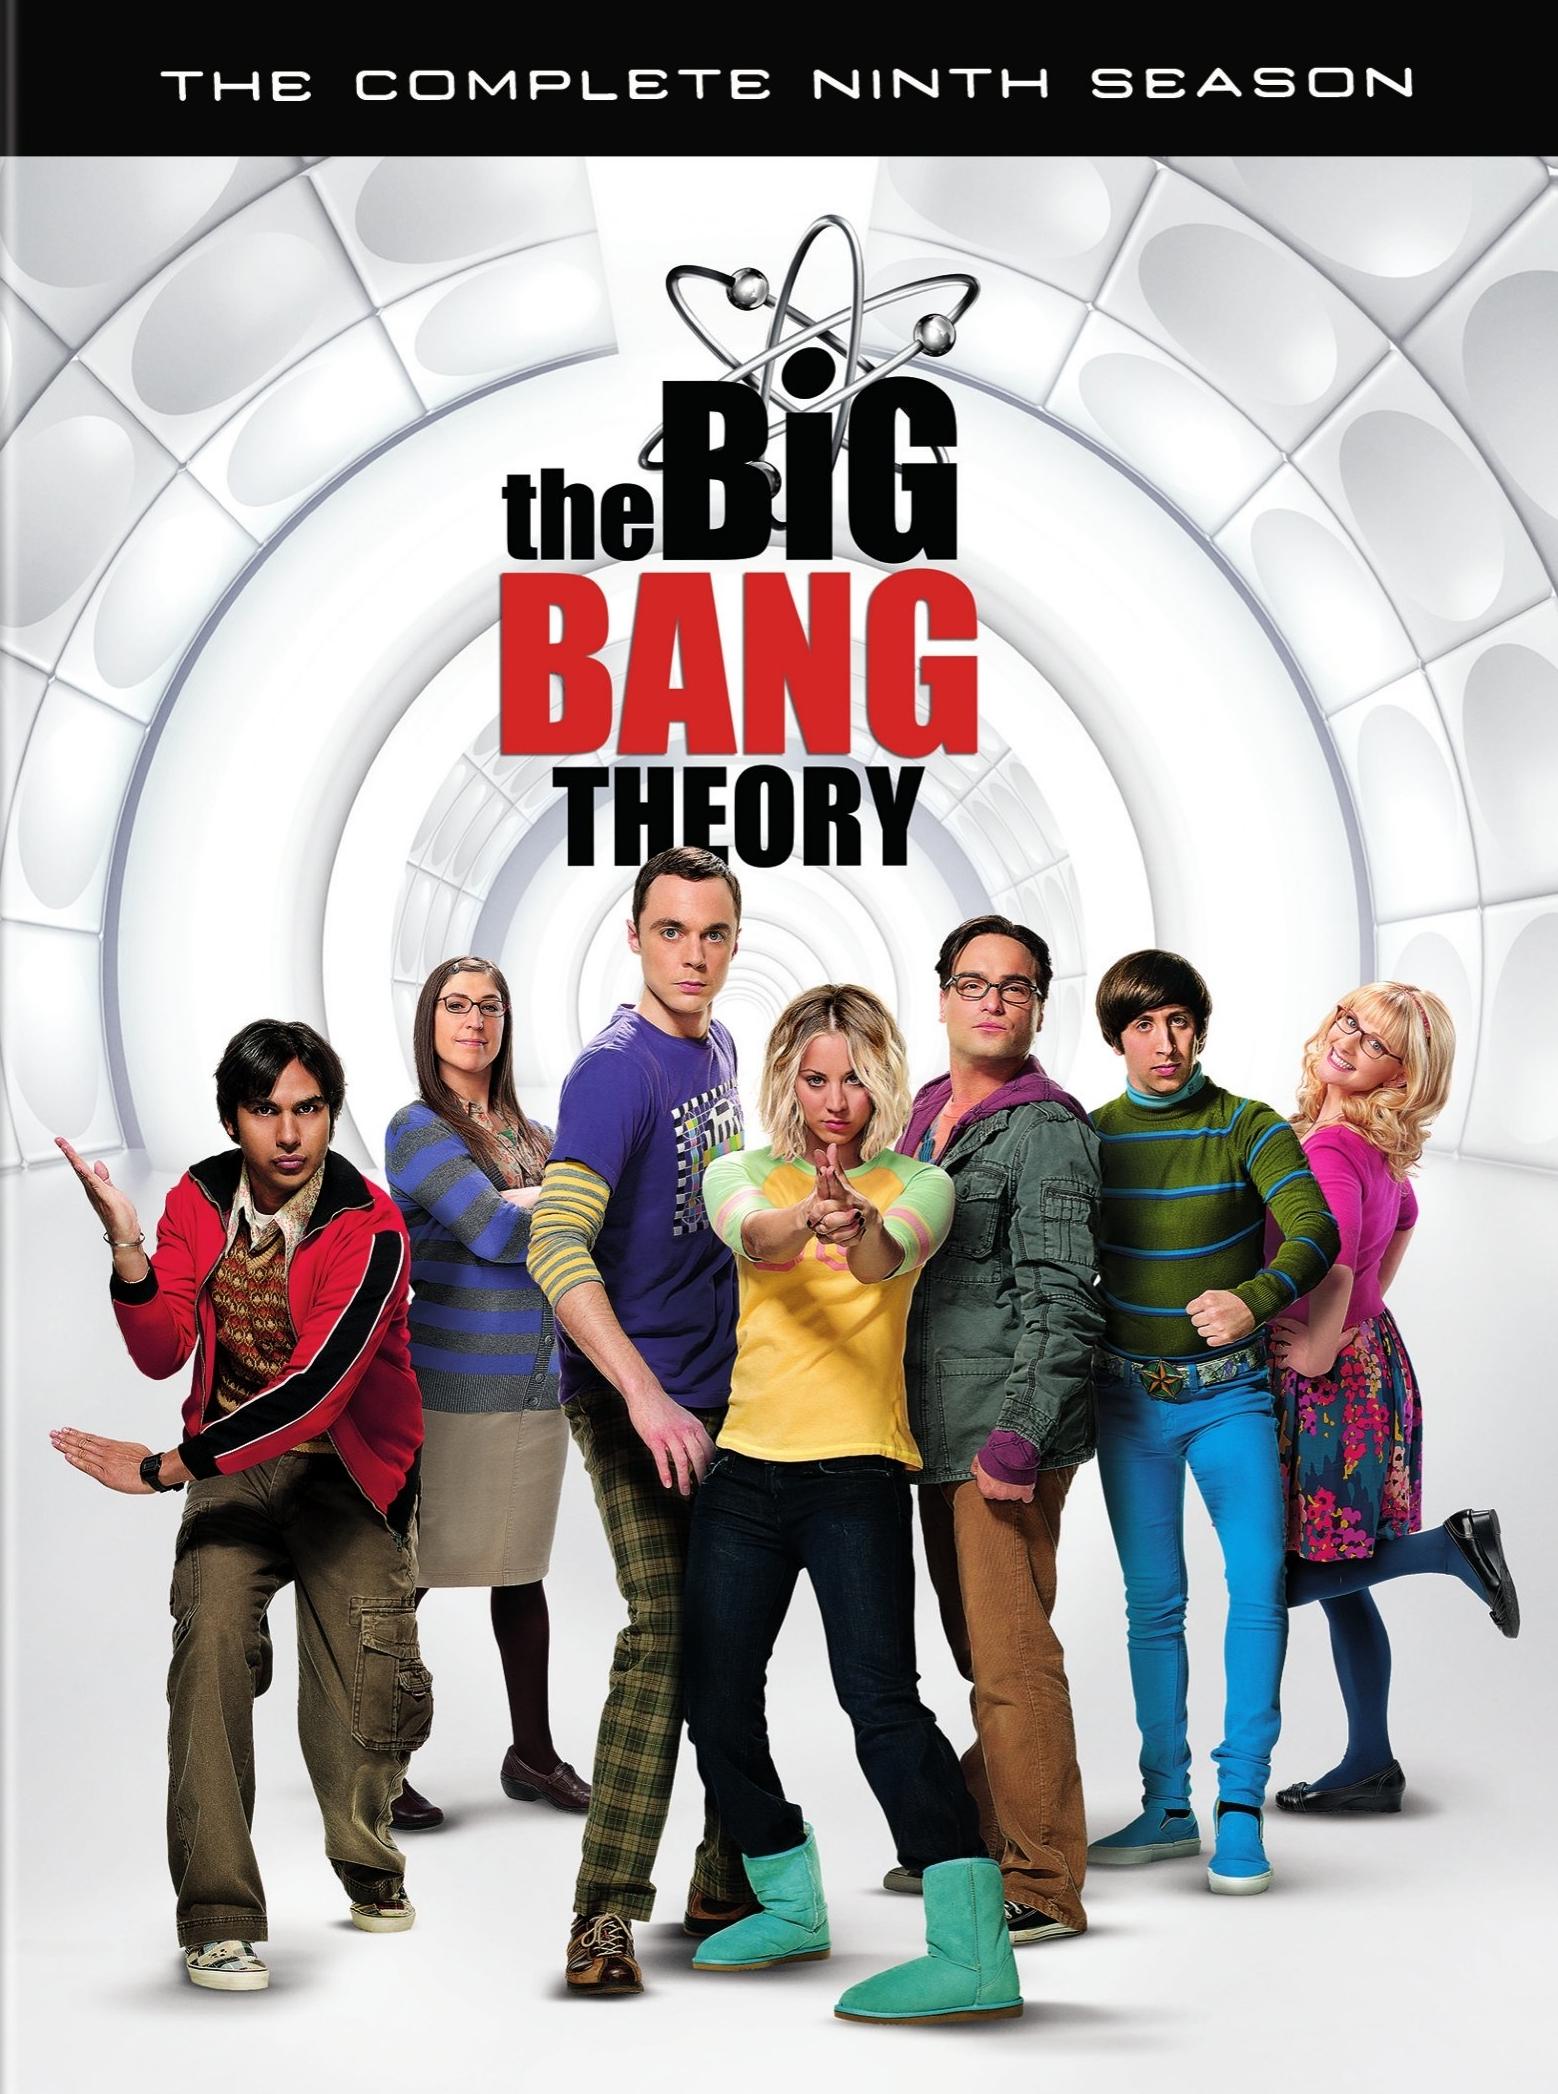 The Big Bang Theory: The Complete Ninth Season [3 Discs] (dvd) 5462116